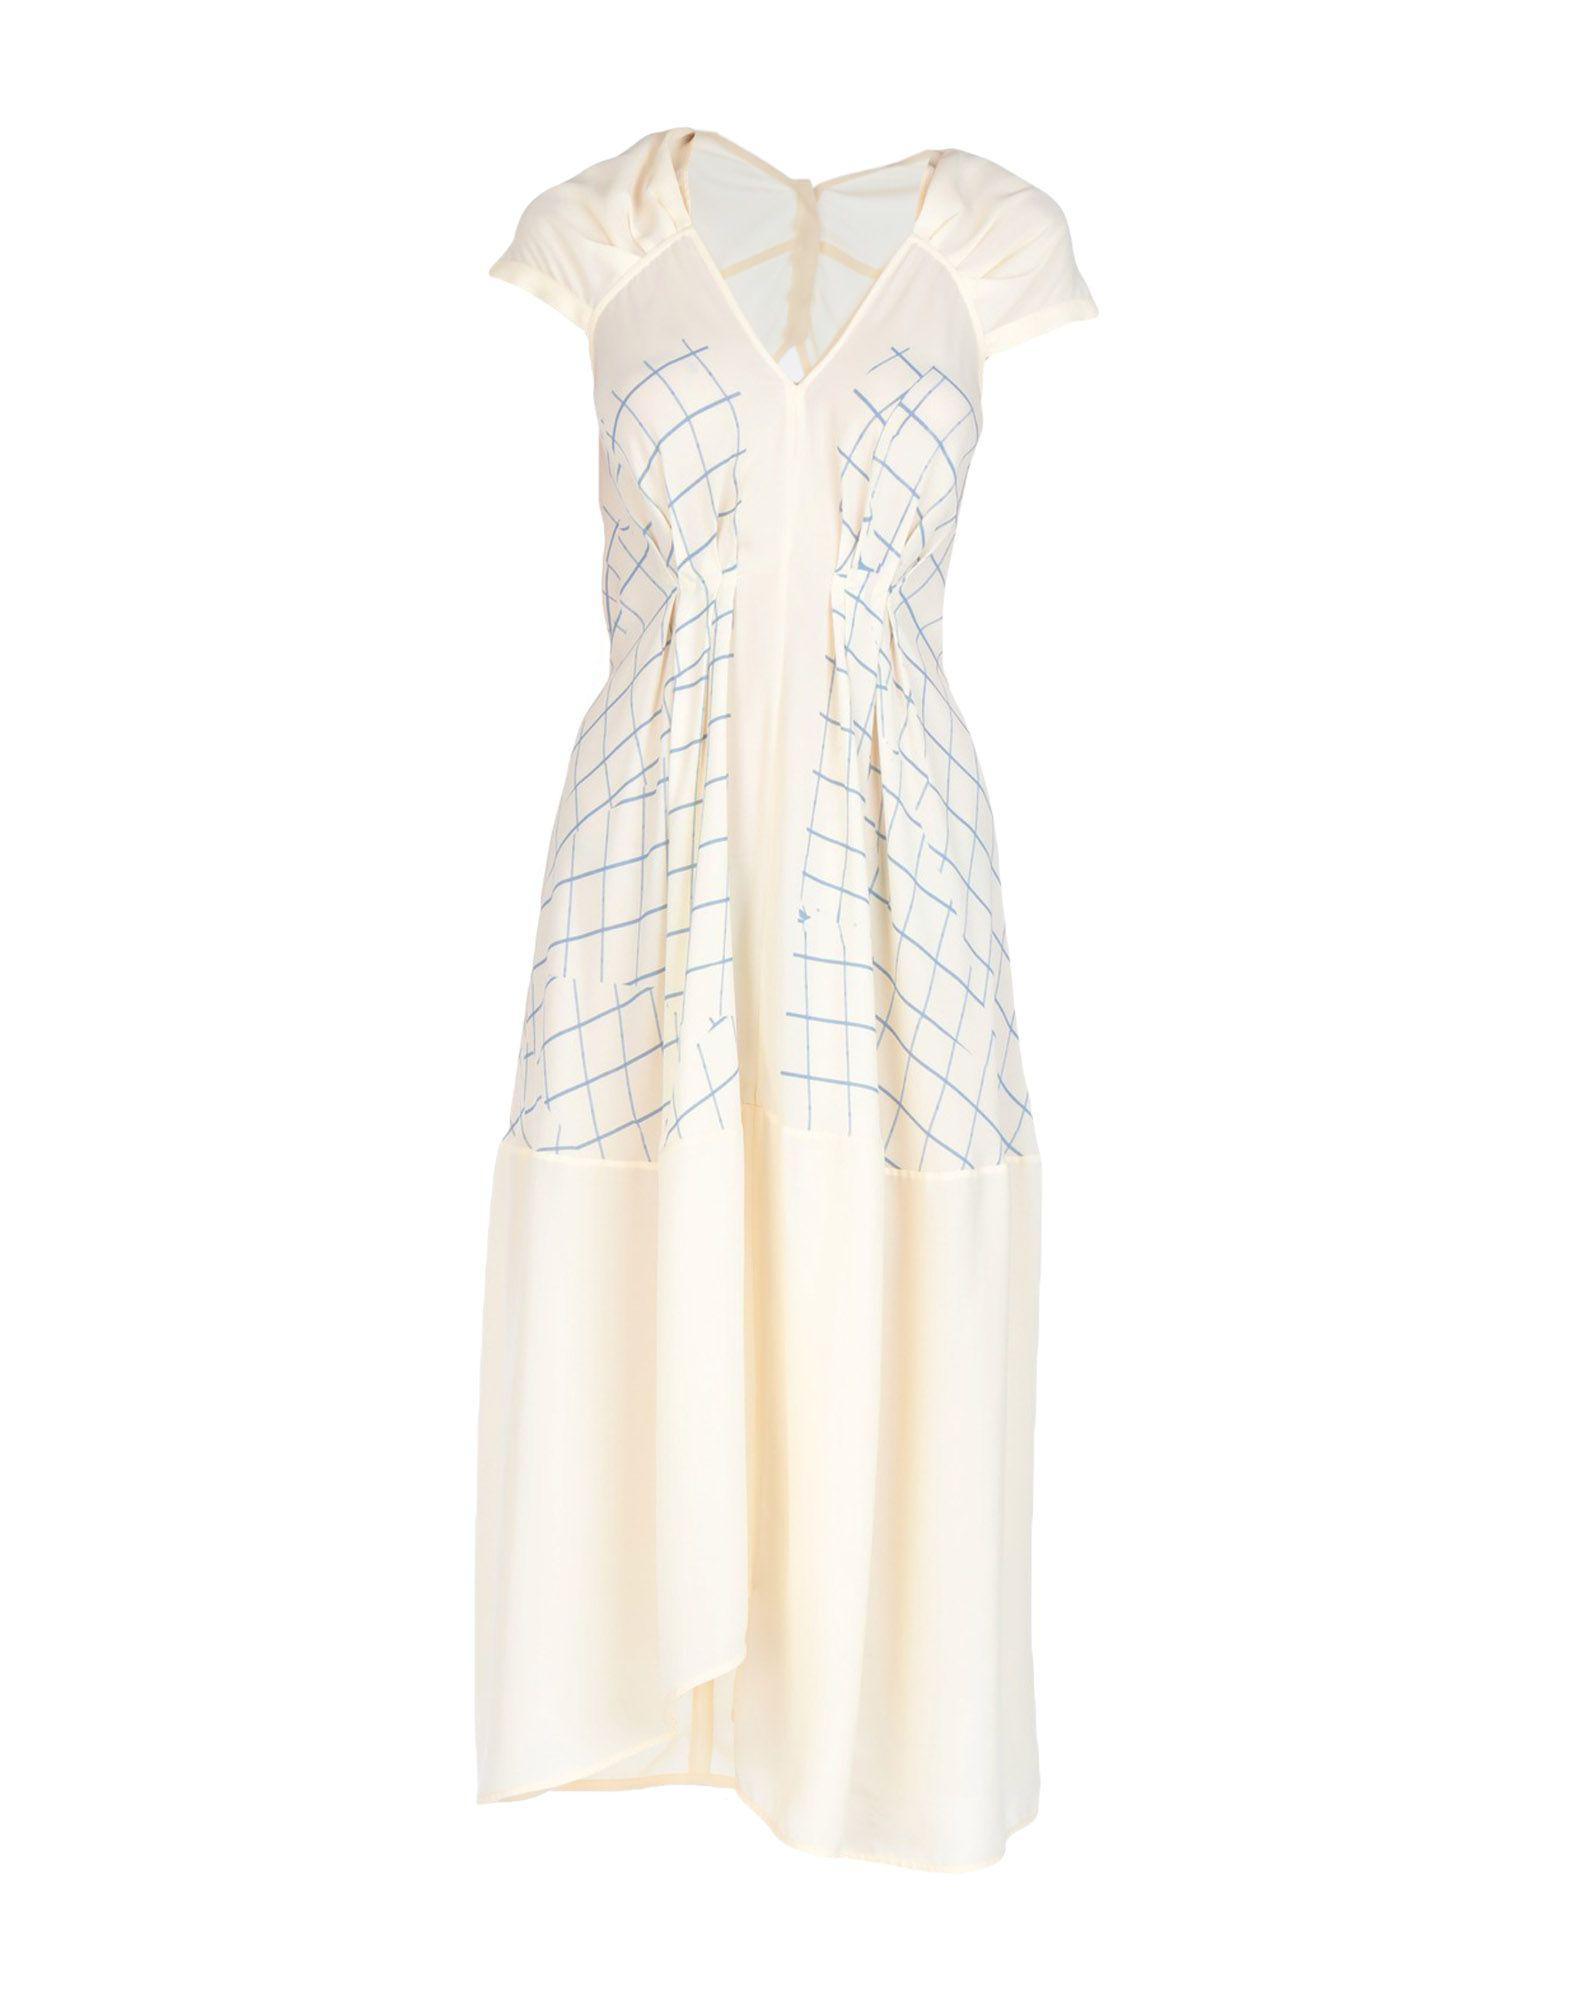 Victoria Beckham Midi Dress In Ivory